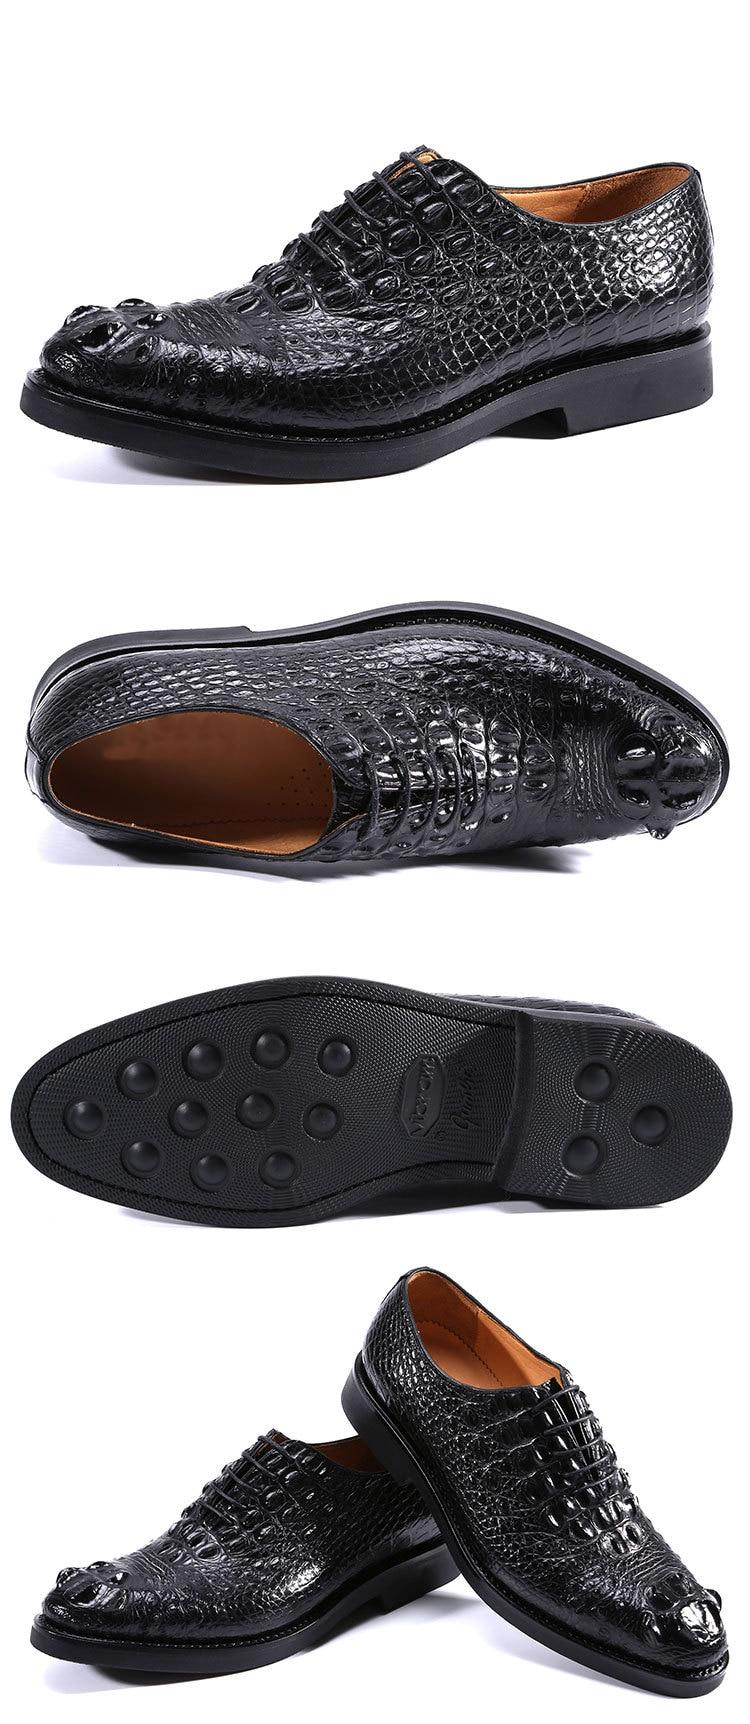 Jineyu sapatos masculinos sapatos de crocodilo sem